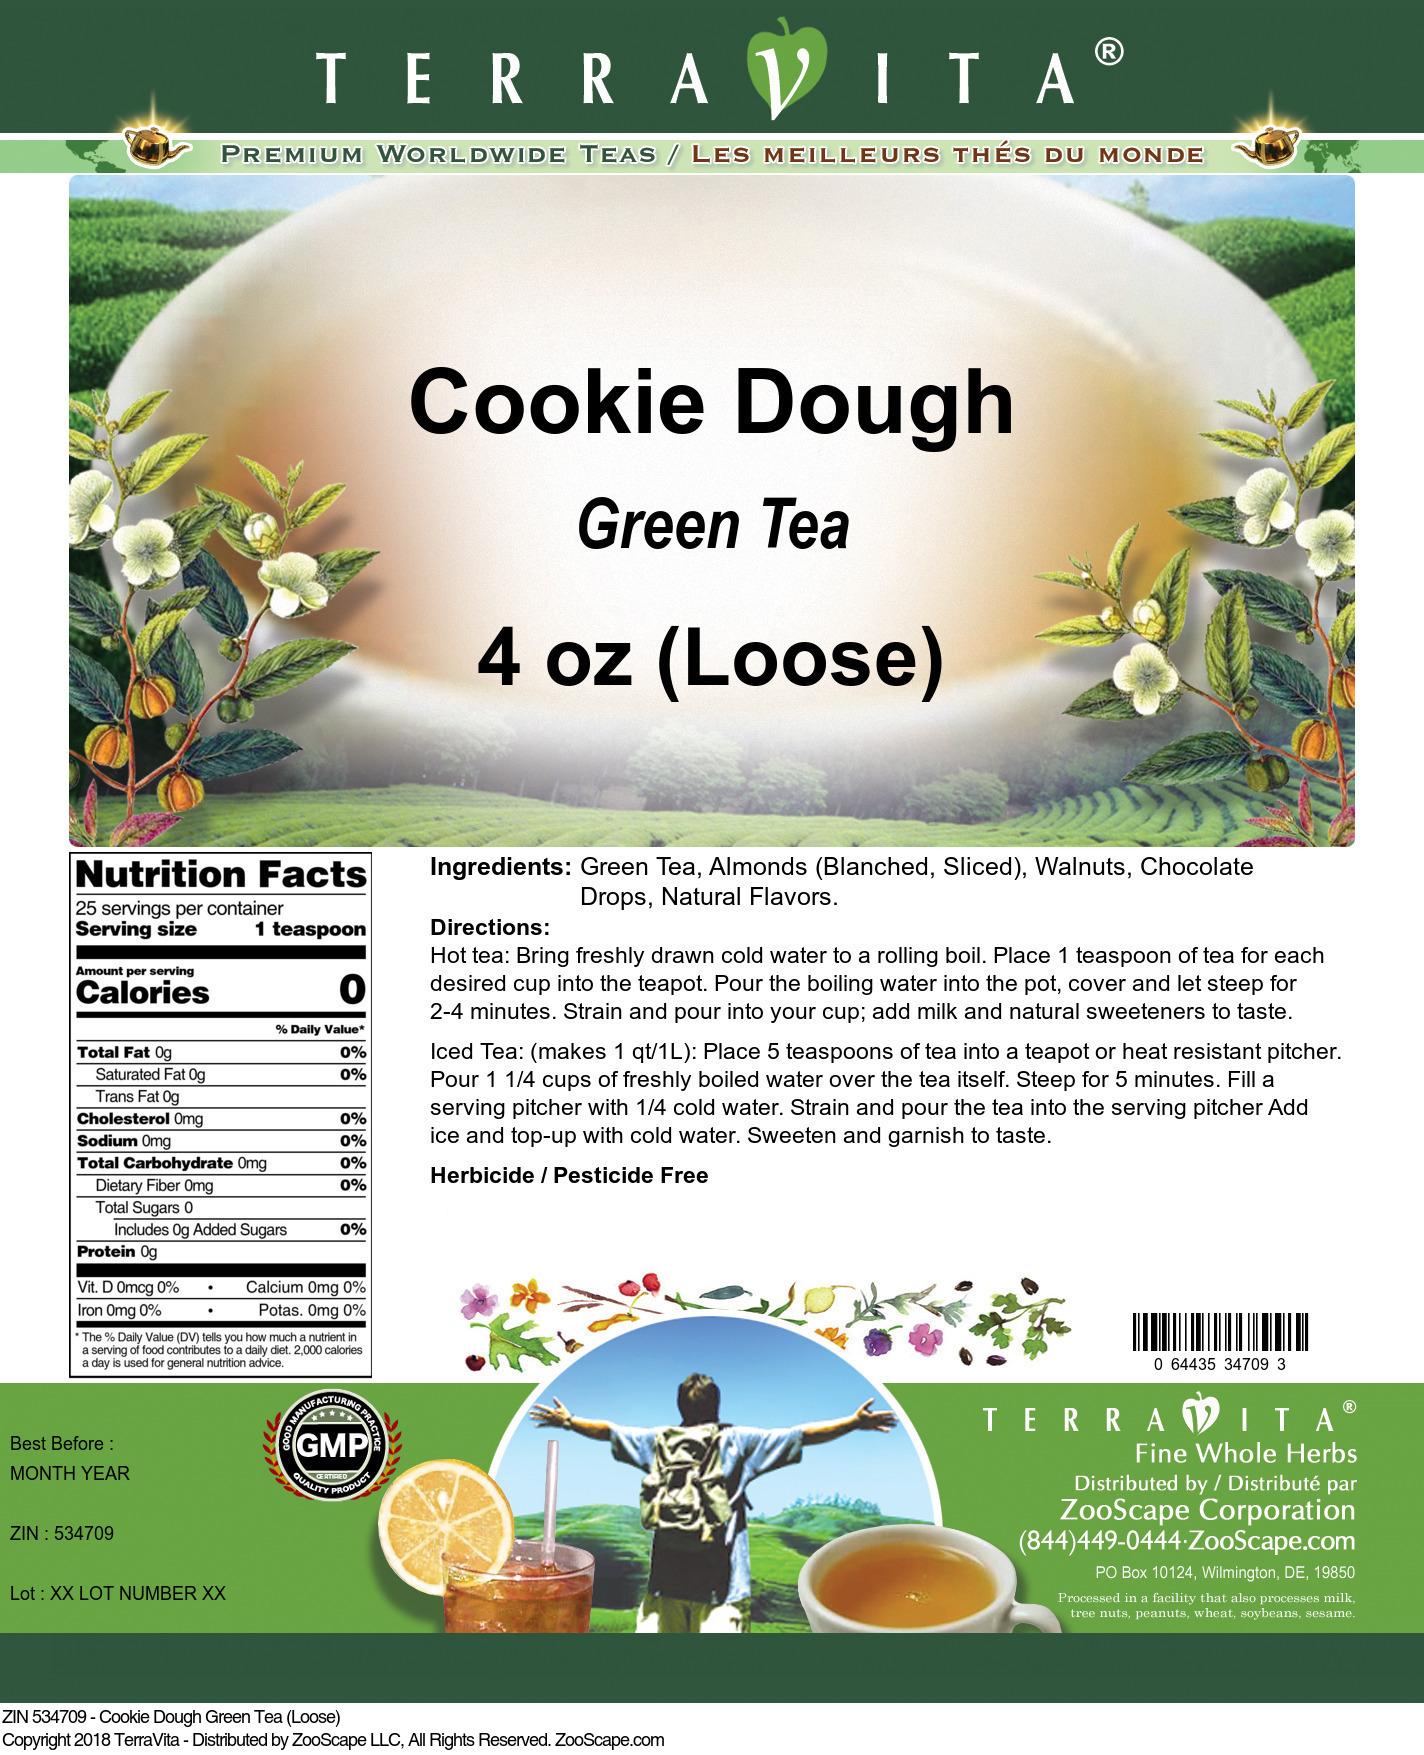 Cookie Dough Green Tea (Loose)